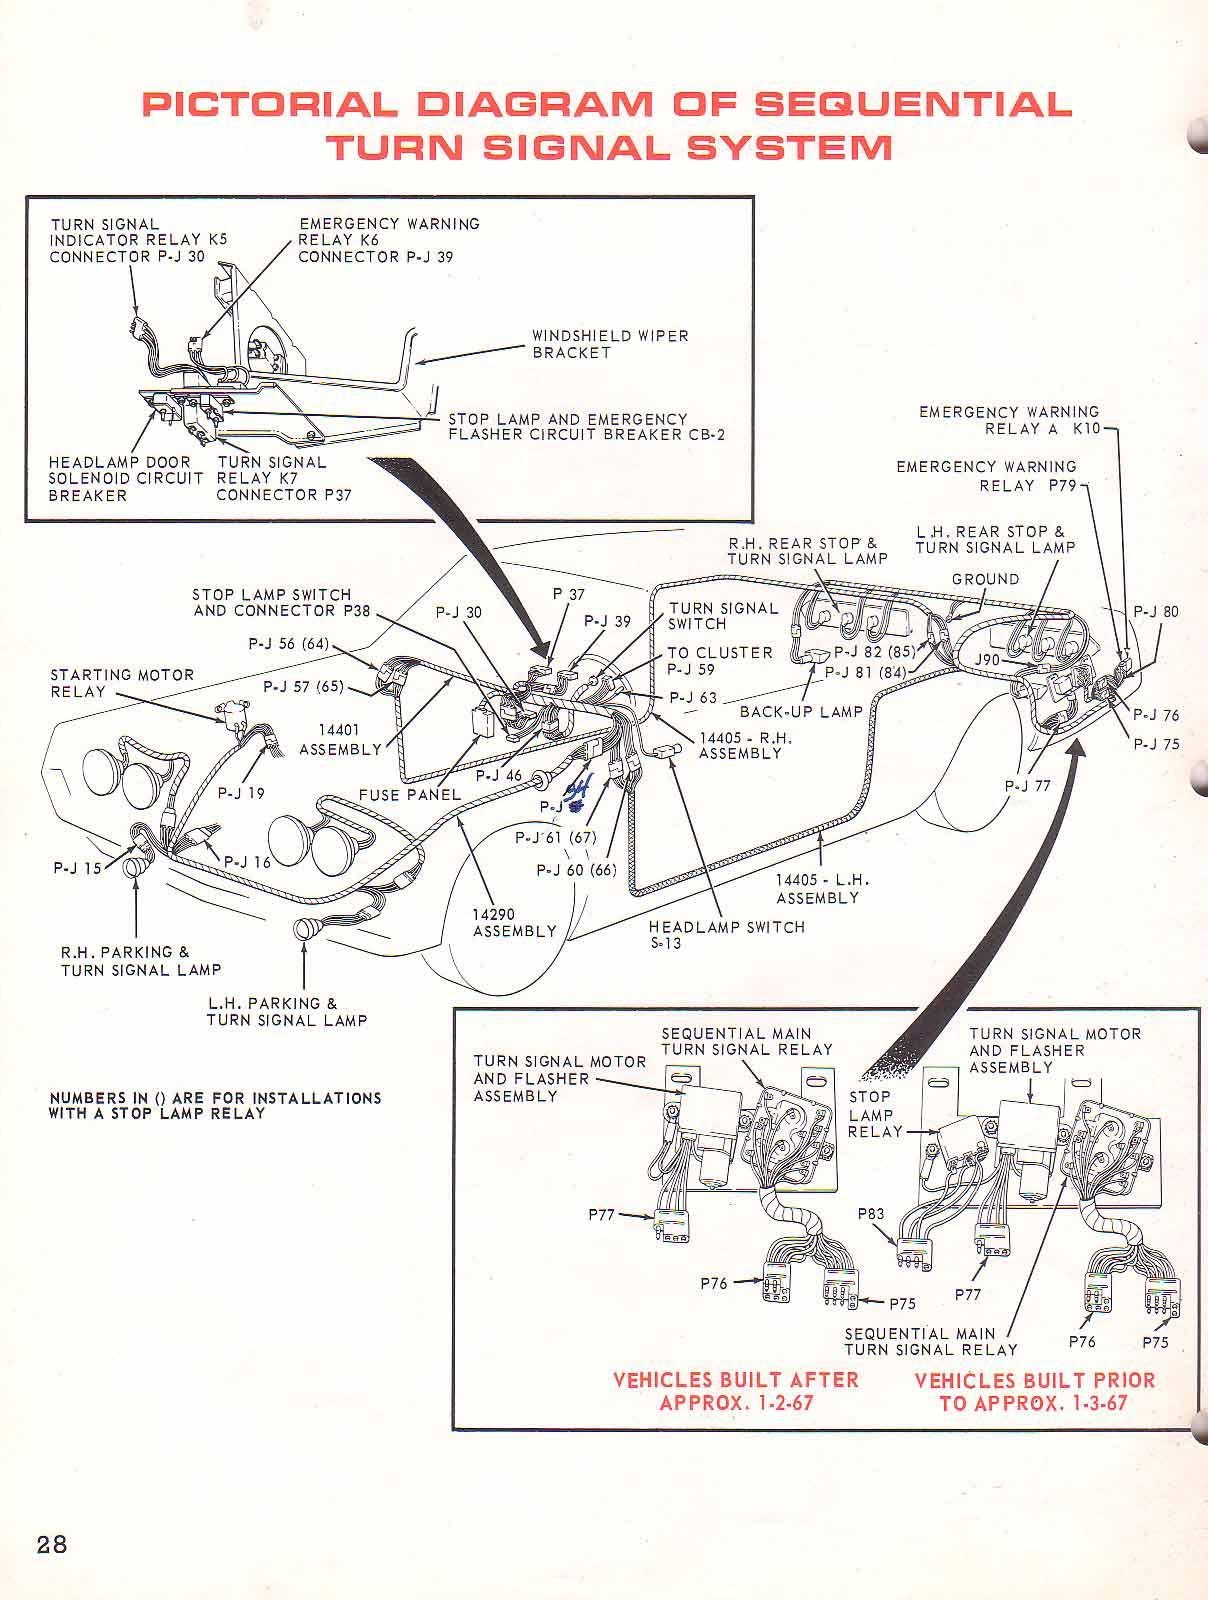 1969 mustang grande wiring diagram